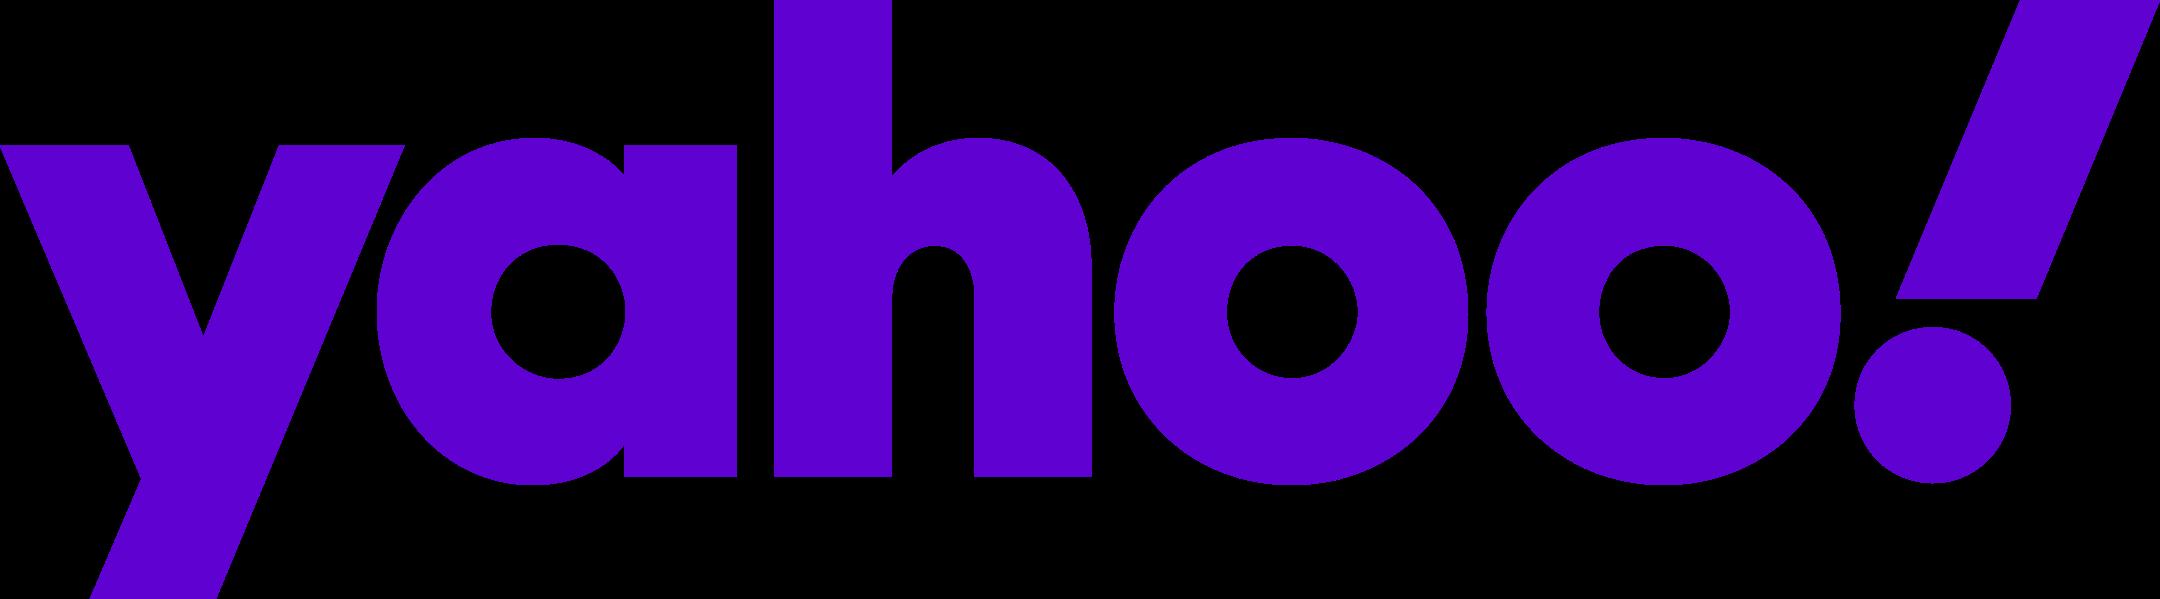 yahoo logo 1 - Yahoo! Logo